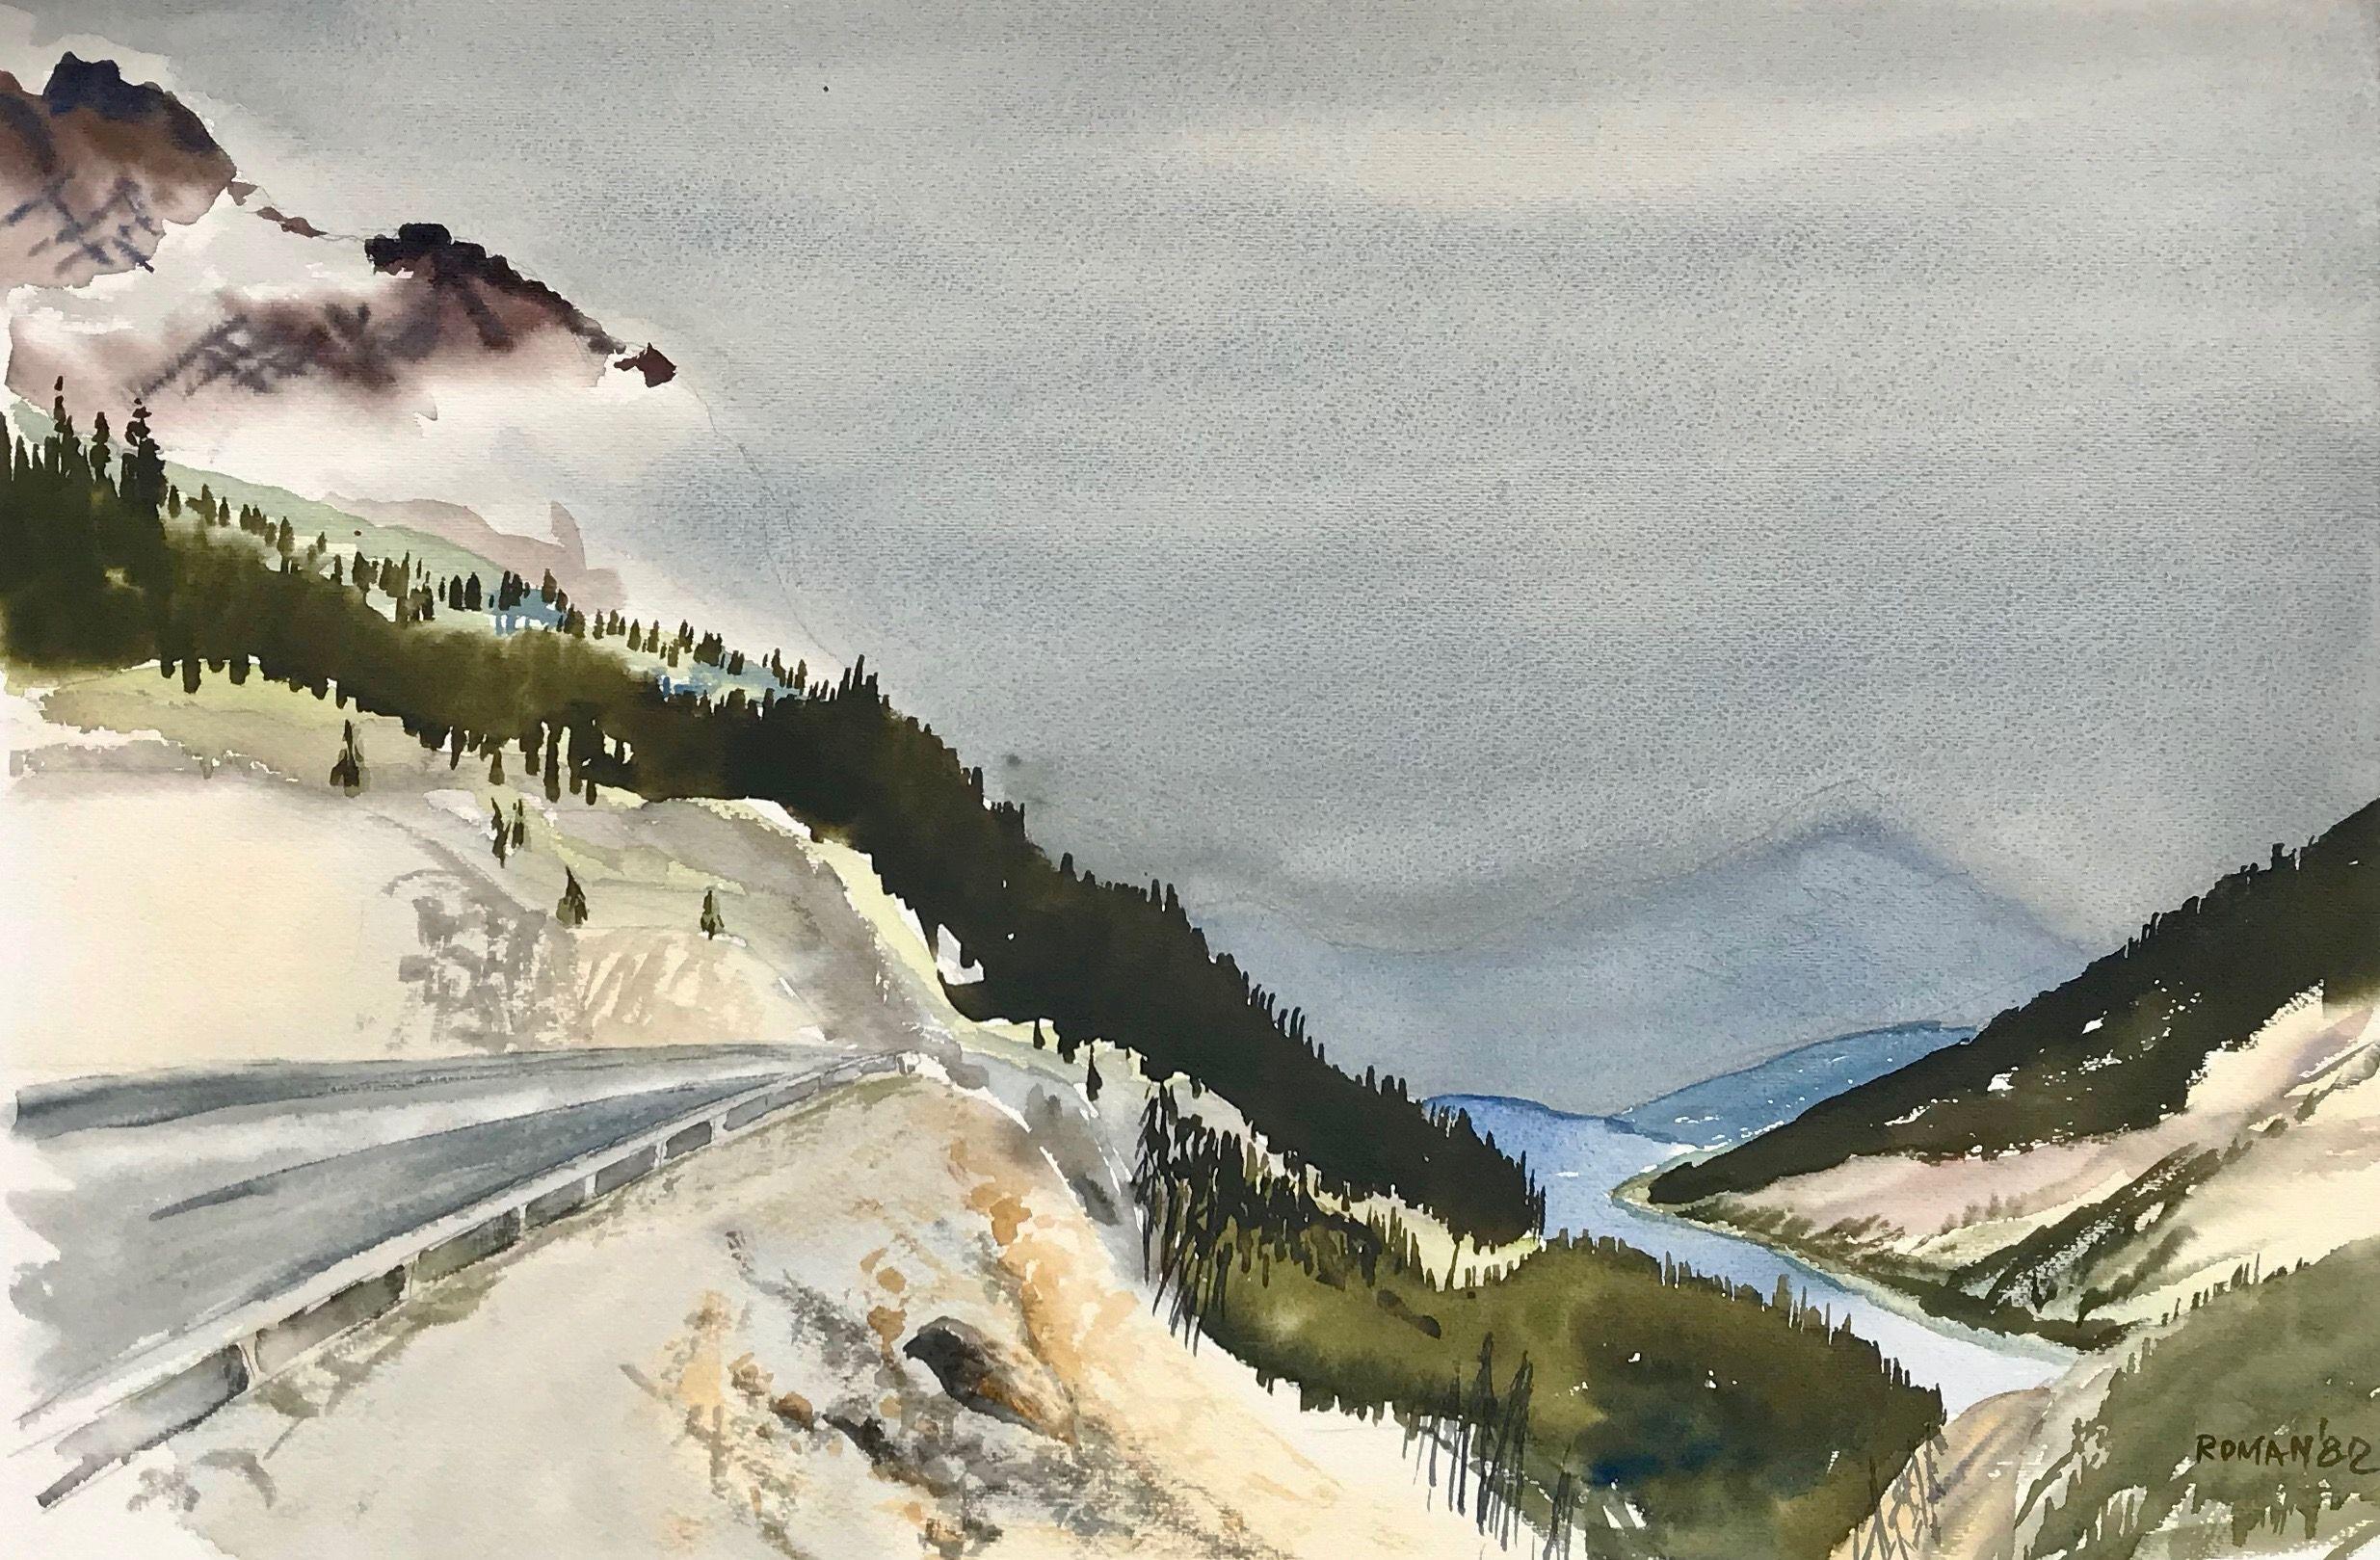 Hidden Mountains (Icefield Parkway Between Banff & Jasper)